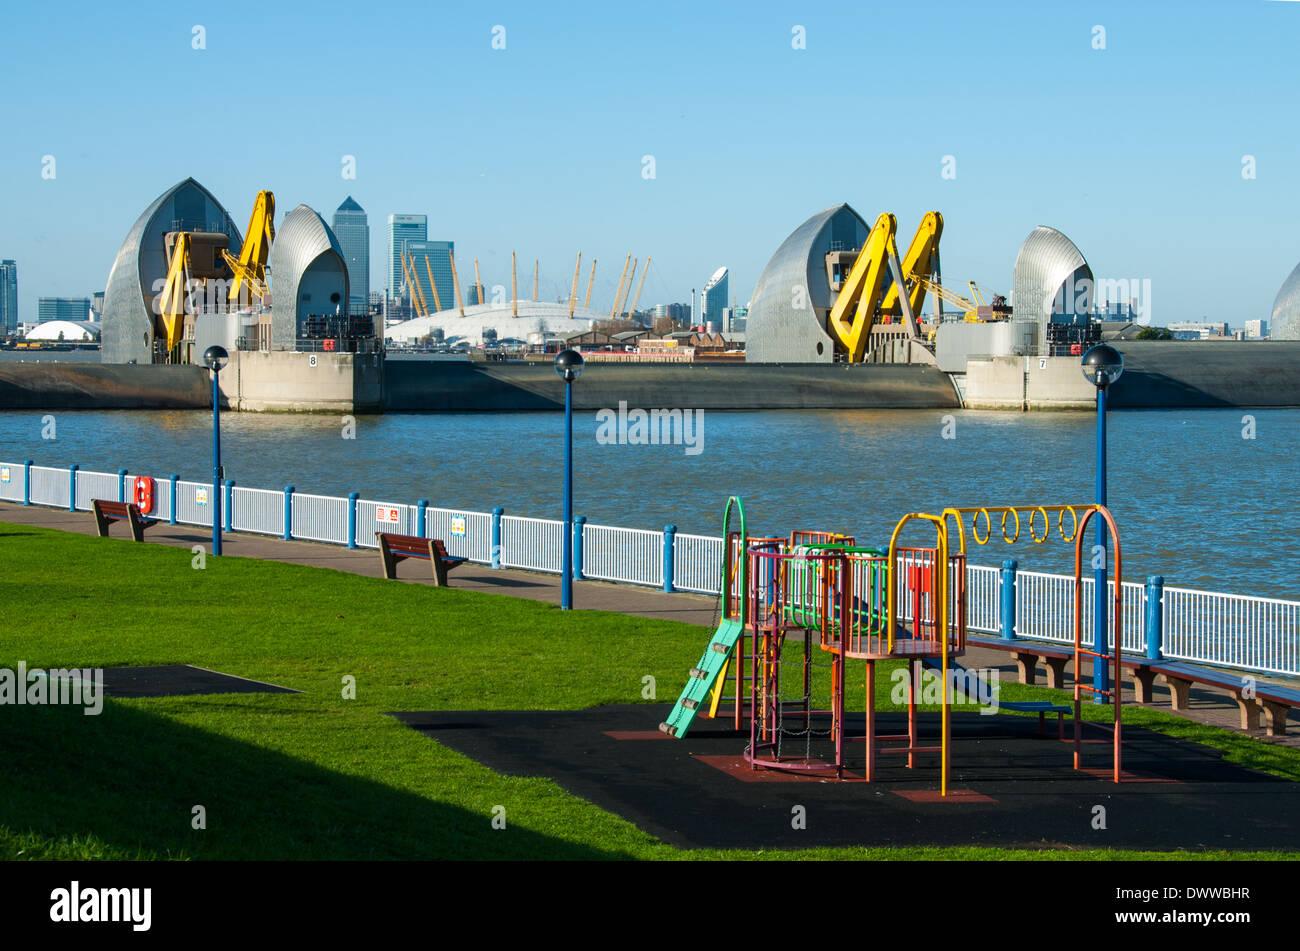 The Thames Barrier, London. UK Stock Photo